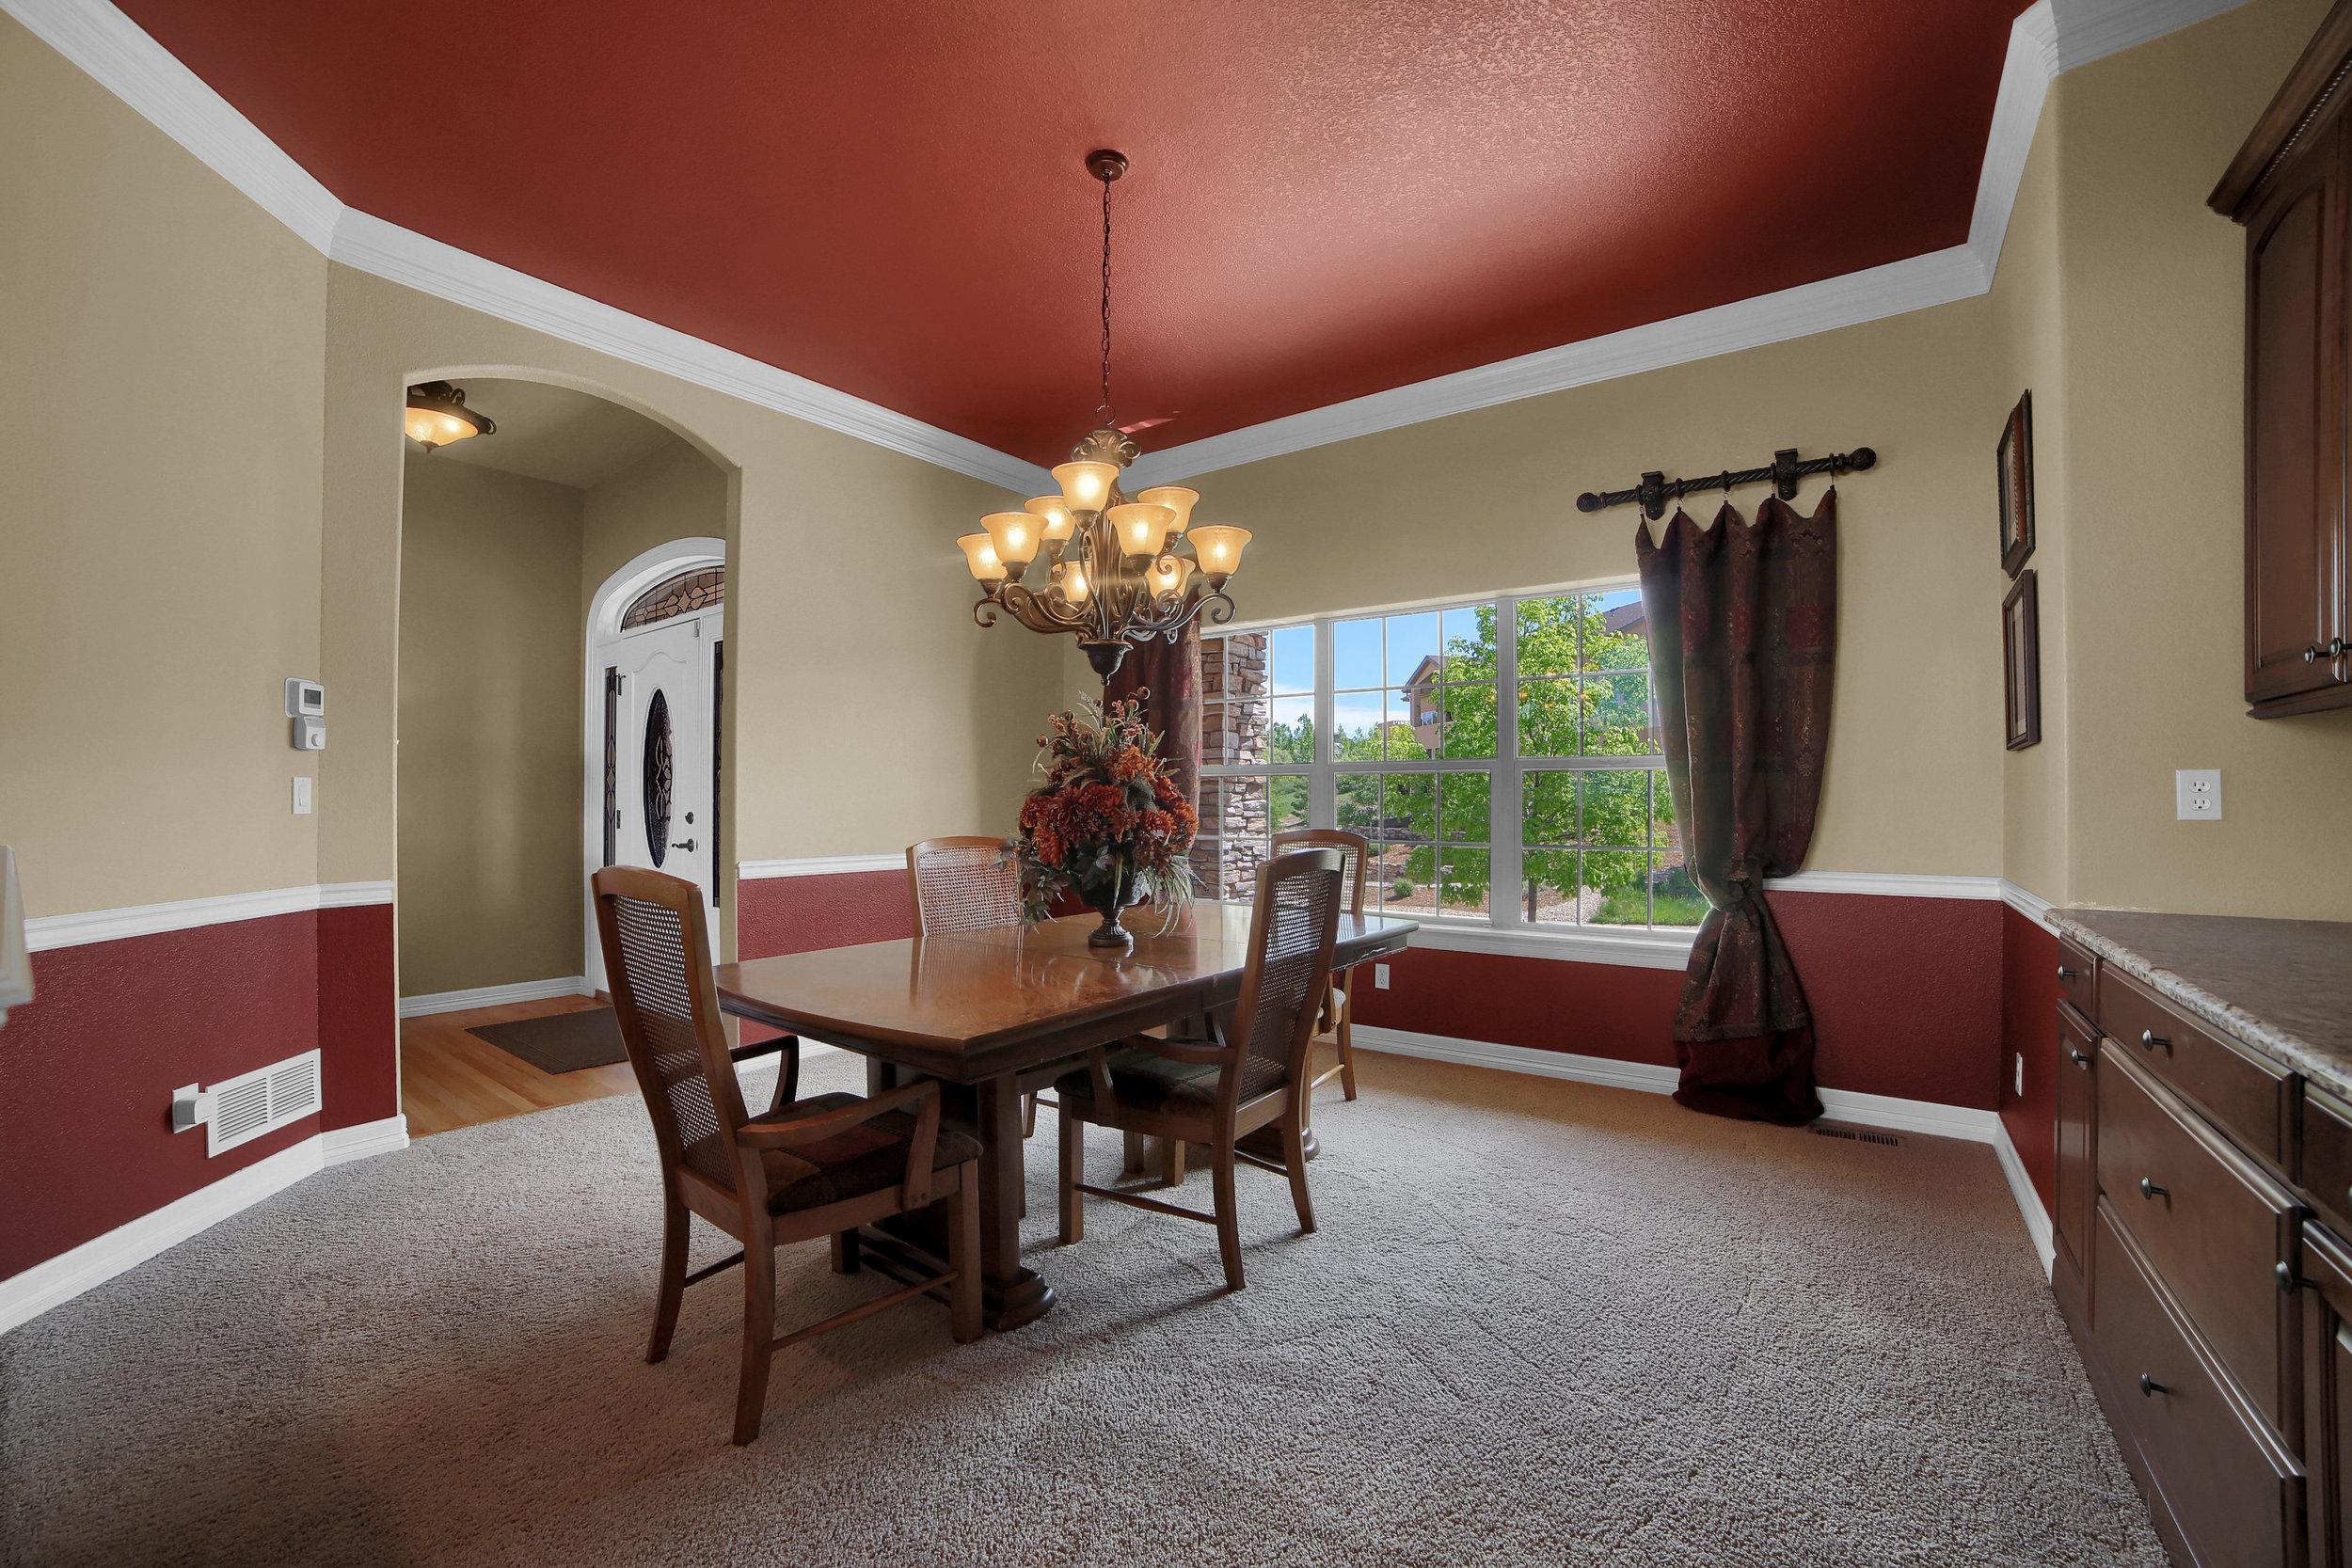 12496 Creekhurst Dr Colorado-print-040-062-Dining Room-3648x2432-300dpi.jpg